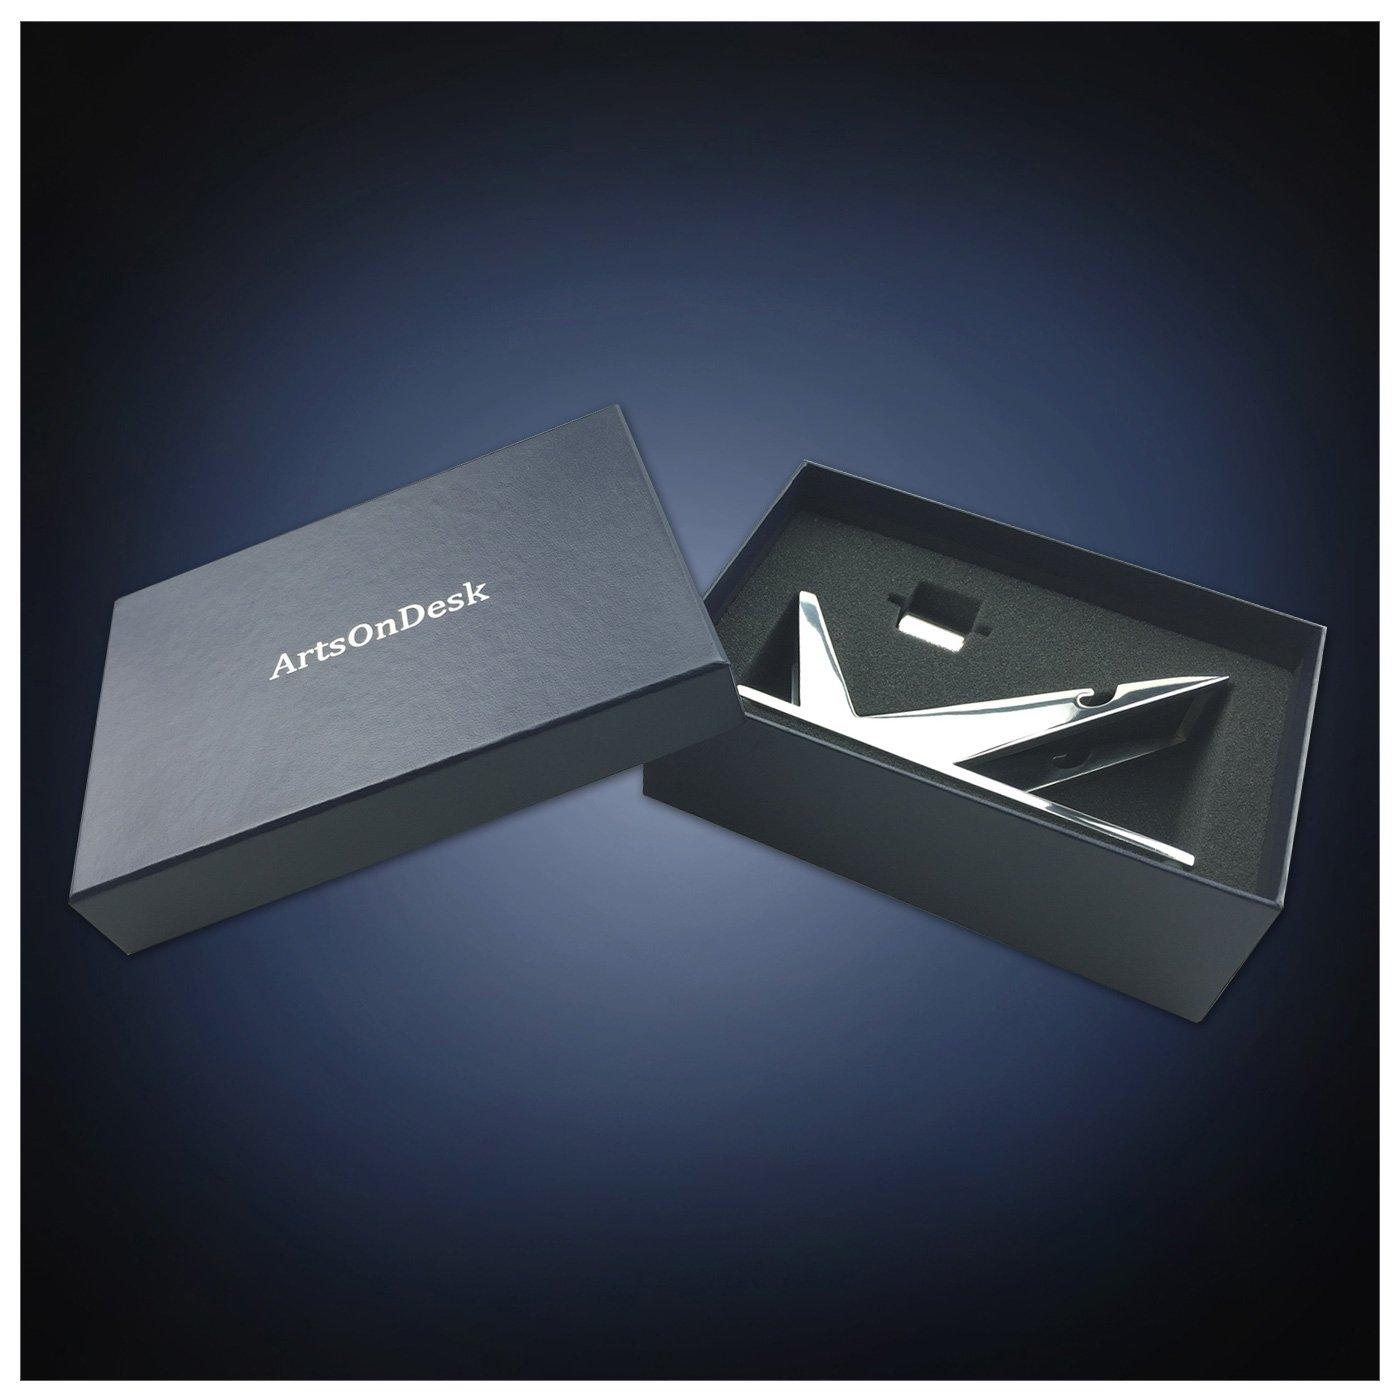 ArtsOnDesk Modern Art Tape Dispenser Mr102 Stainless Steel Mirror Polish Patented Luxury High-end Desk Accessory Office Organizer Cutter Thanksgiving Gift Christmas Gift by ArtsOnDesk (Image #4)